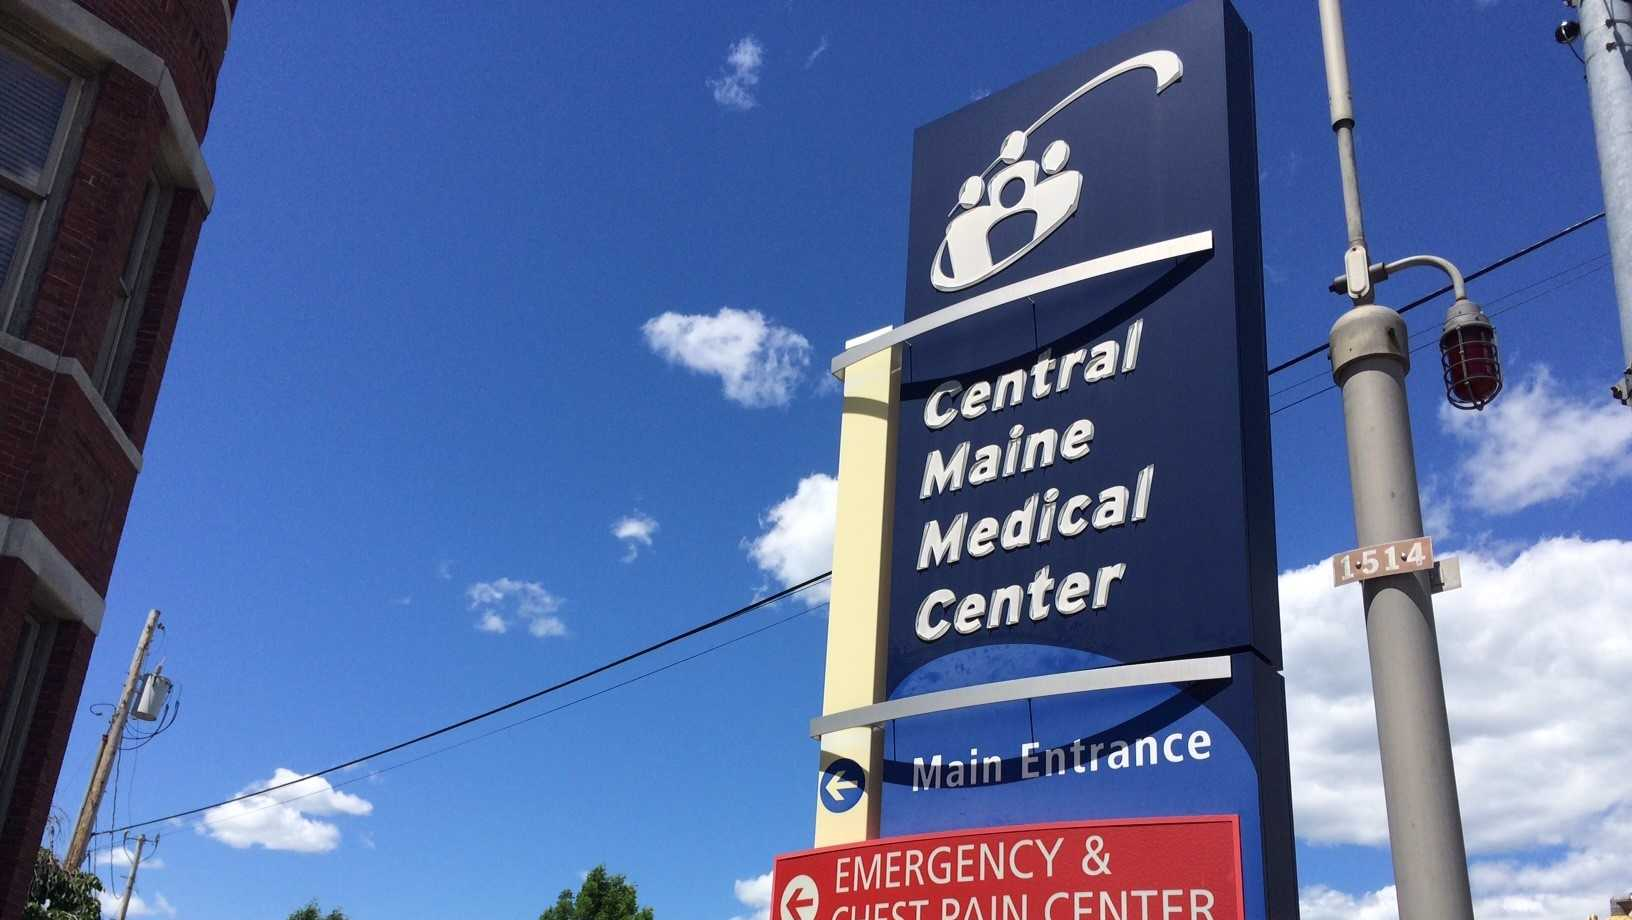 Central Maine Medical Center